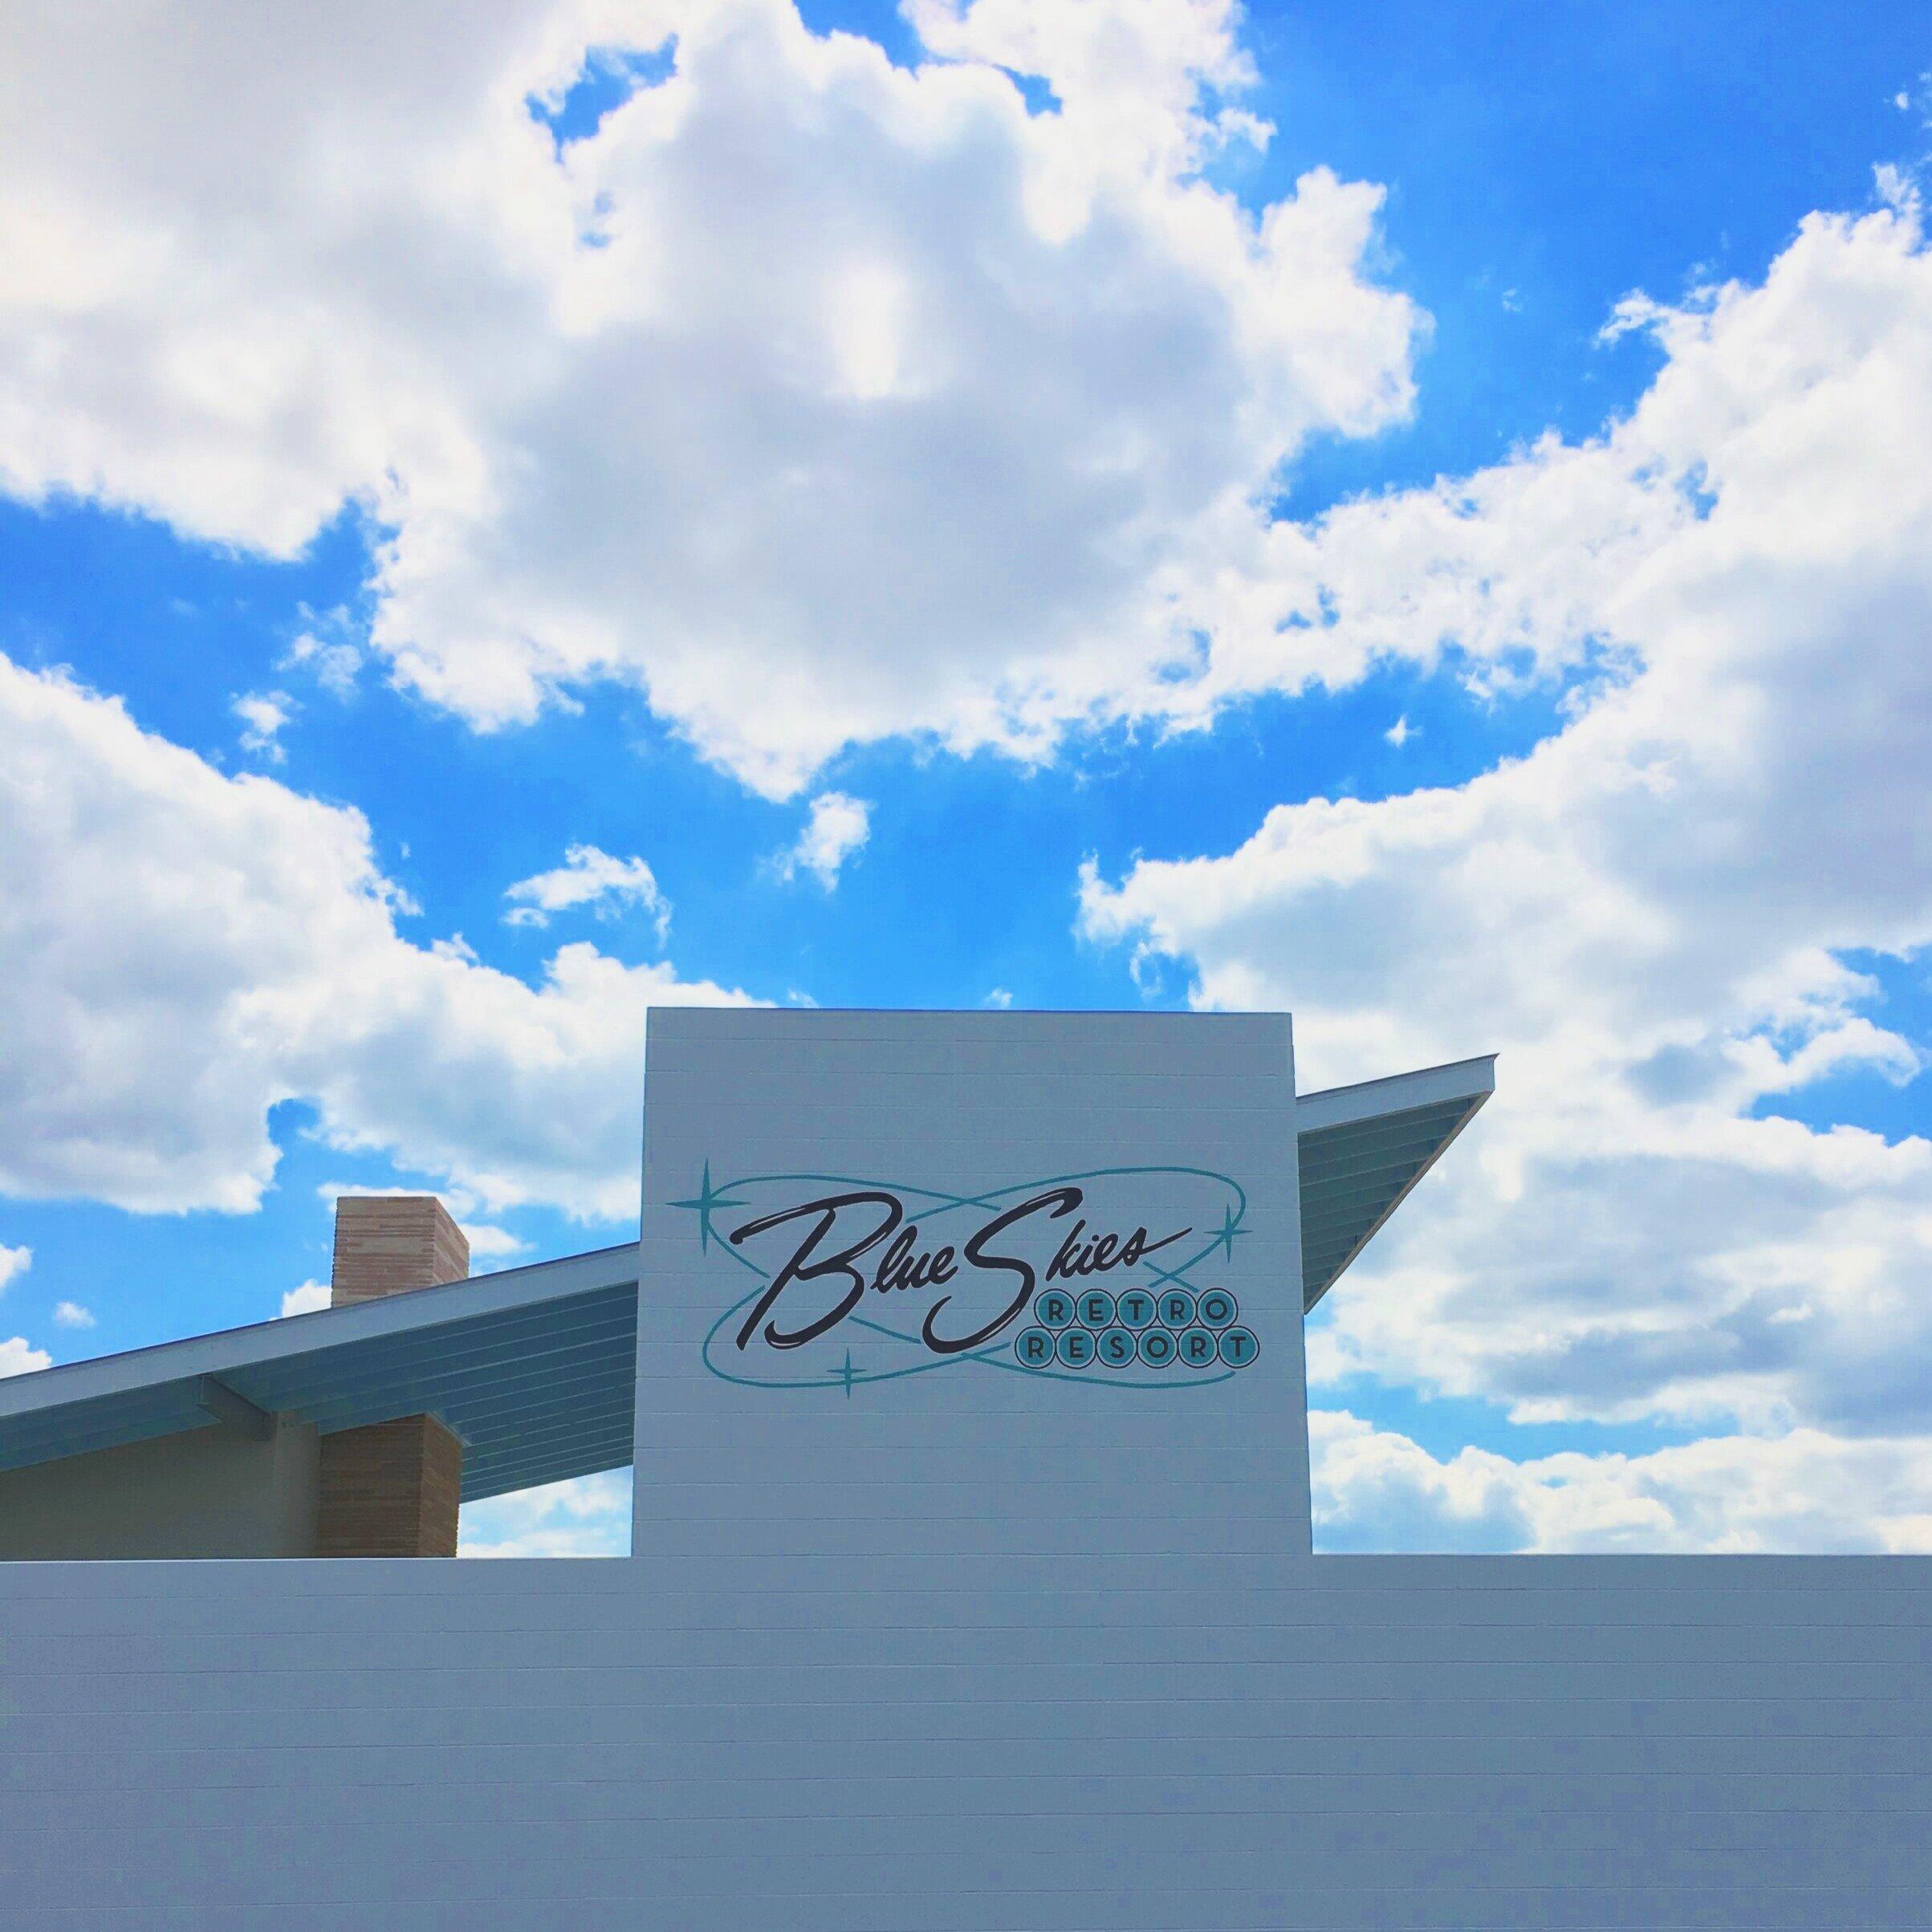 Blue Skies Retro Resort Sign Painting, Fredericksburg